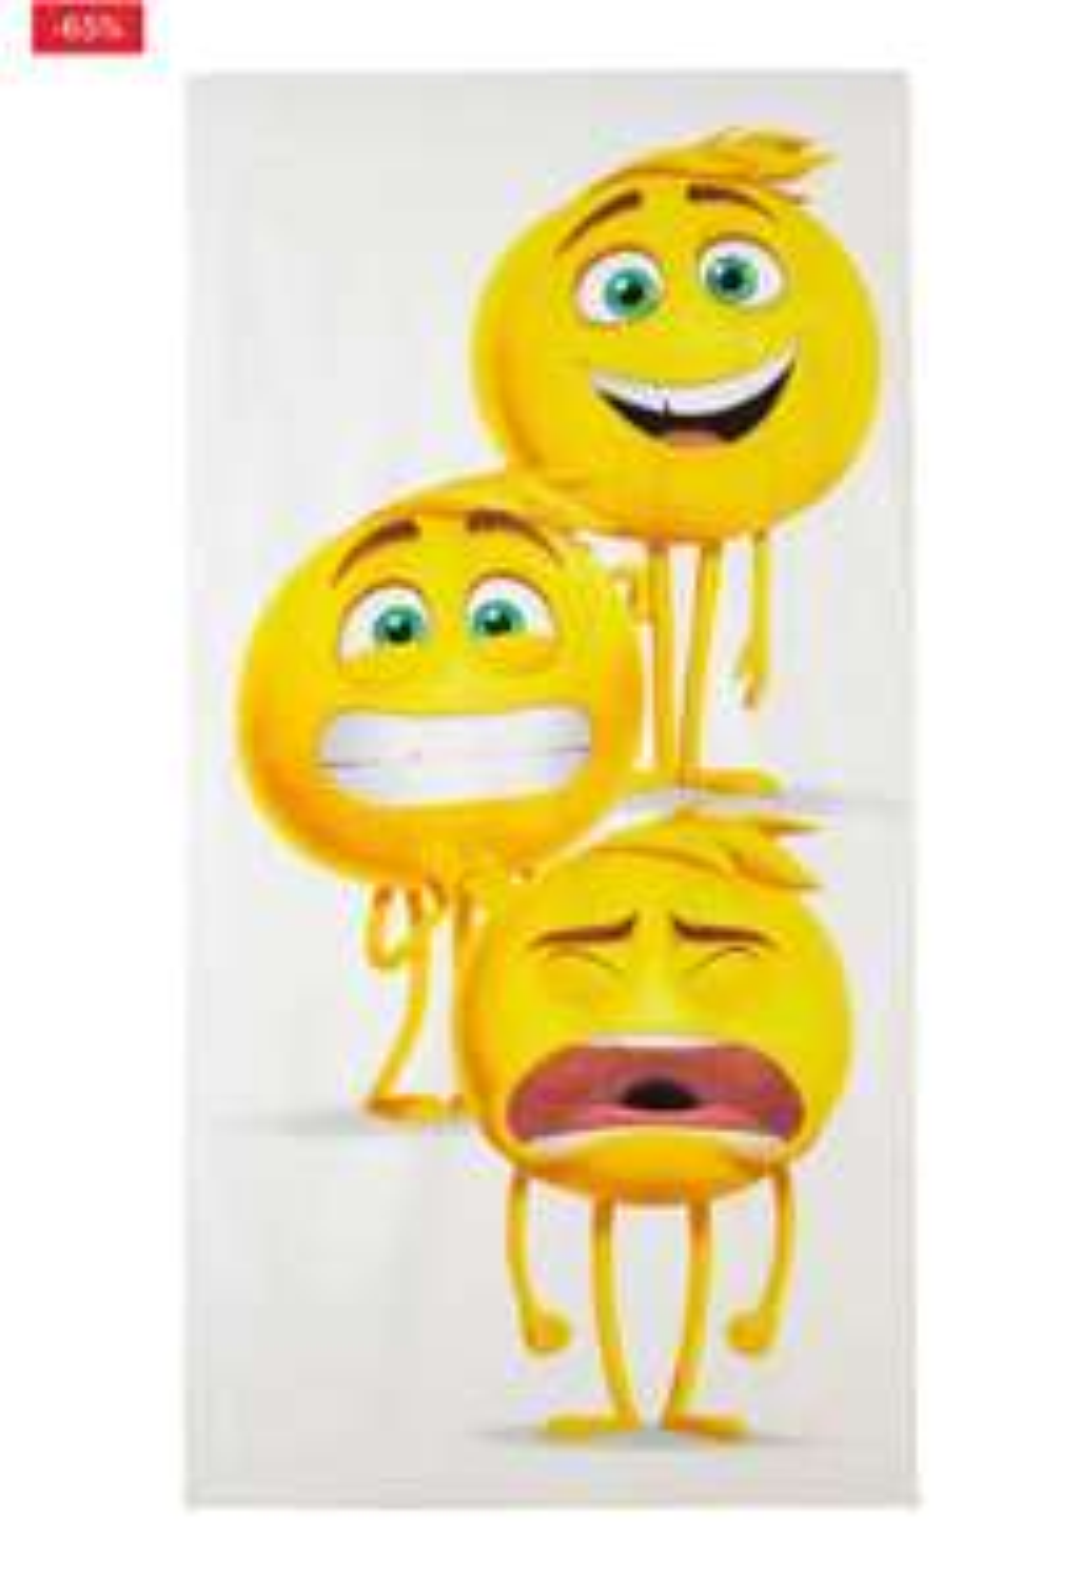 Emoji kinder (strand) baddoek van 14,95 voor 5,23 @wehkamp